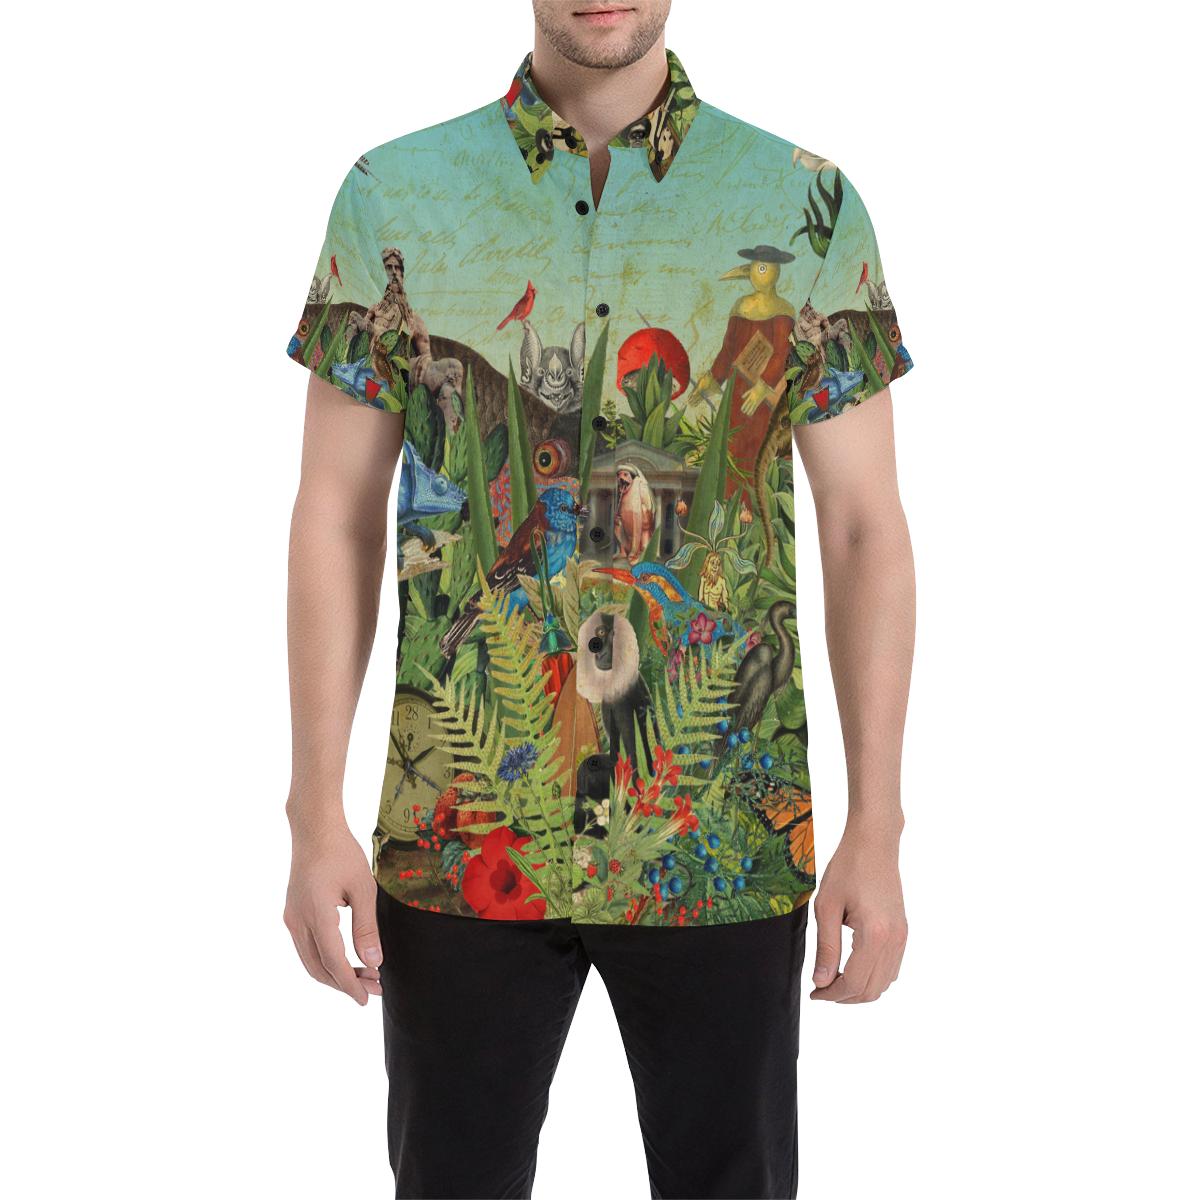 Men's All Over Print Shirt (Flora and Fauna)